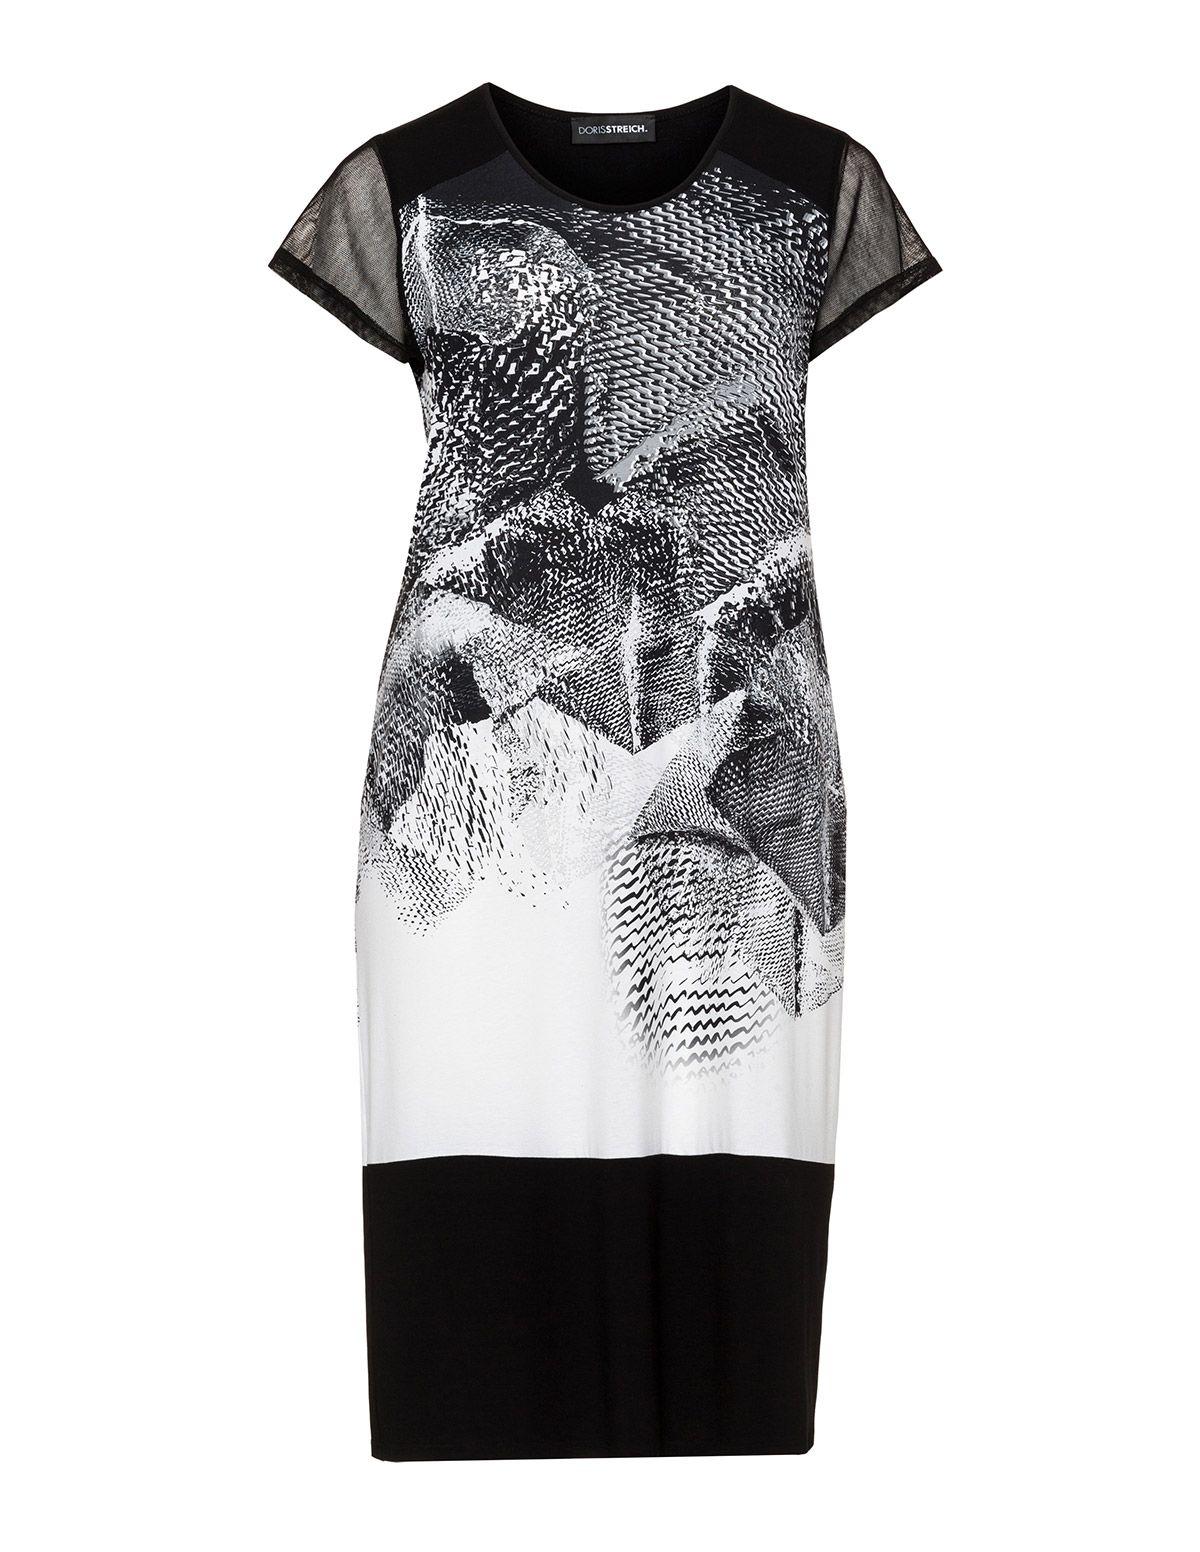 Doris Streich Two tone print dress in Black / White | MS in 2019 ...